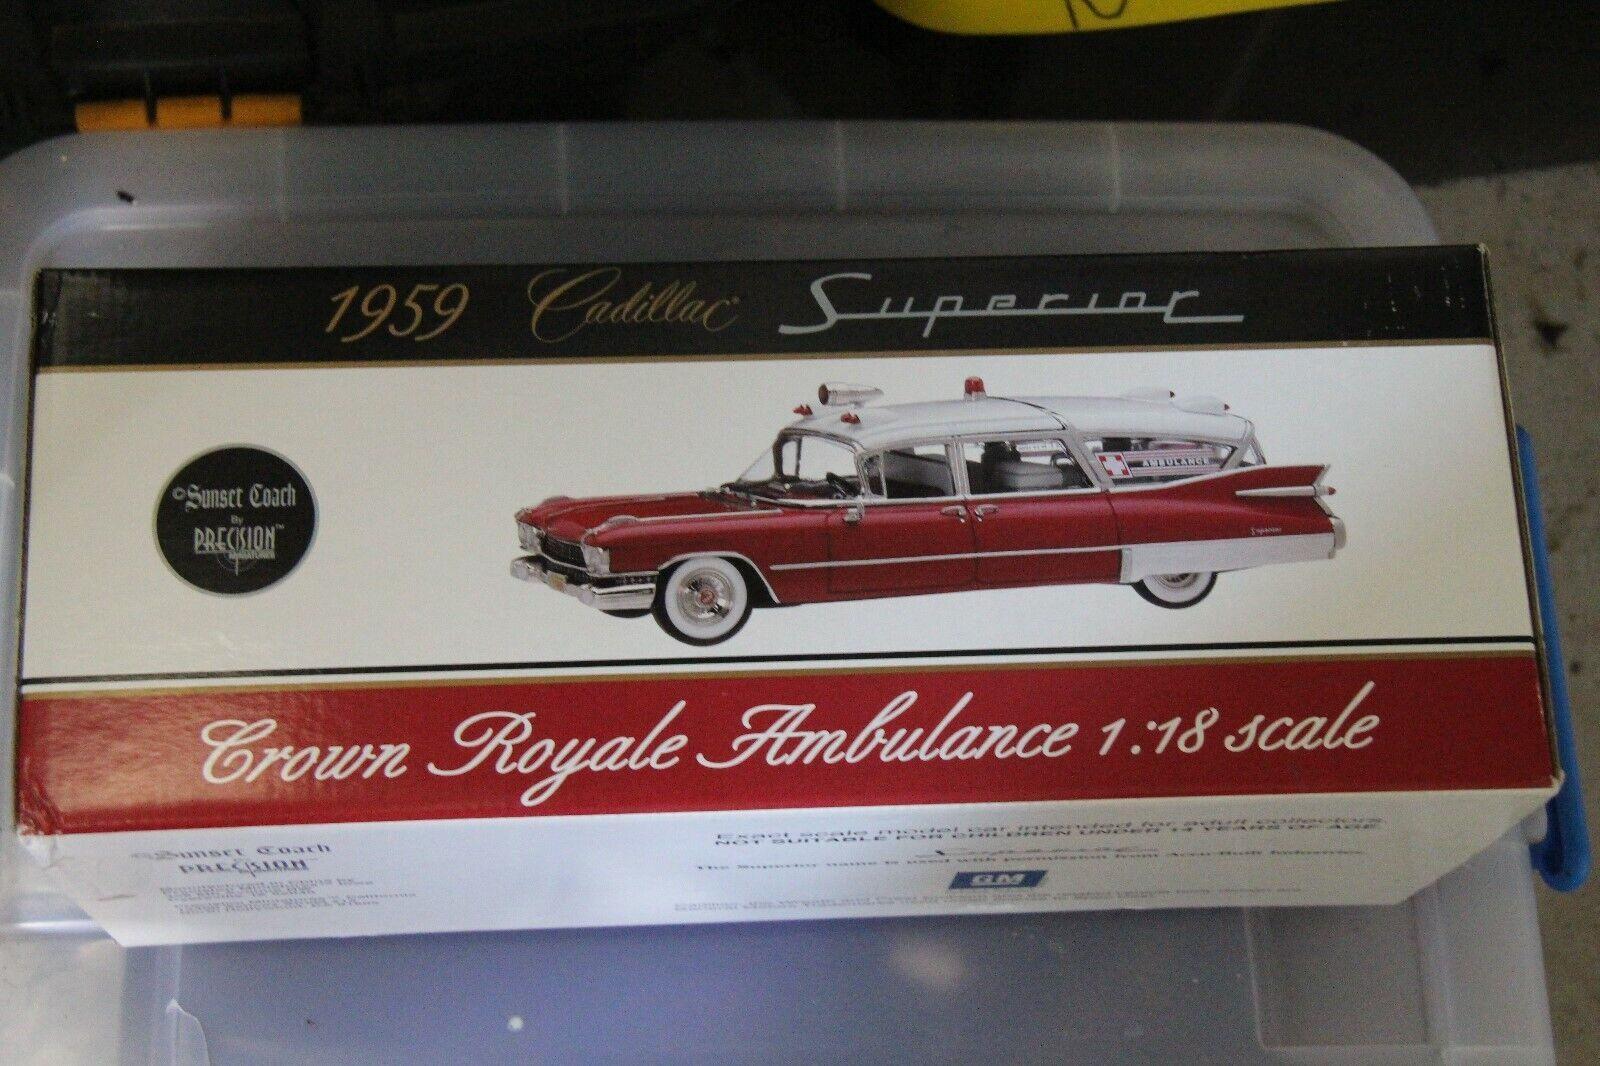 Cadillac 1959 Crown Royale Ambulance, White, Precision Miniatures,1 18, PMSC-03W